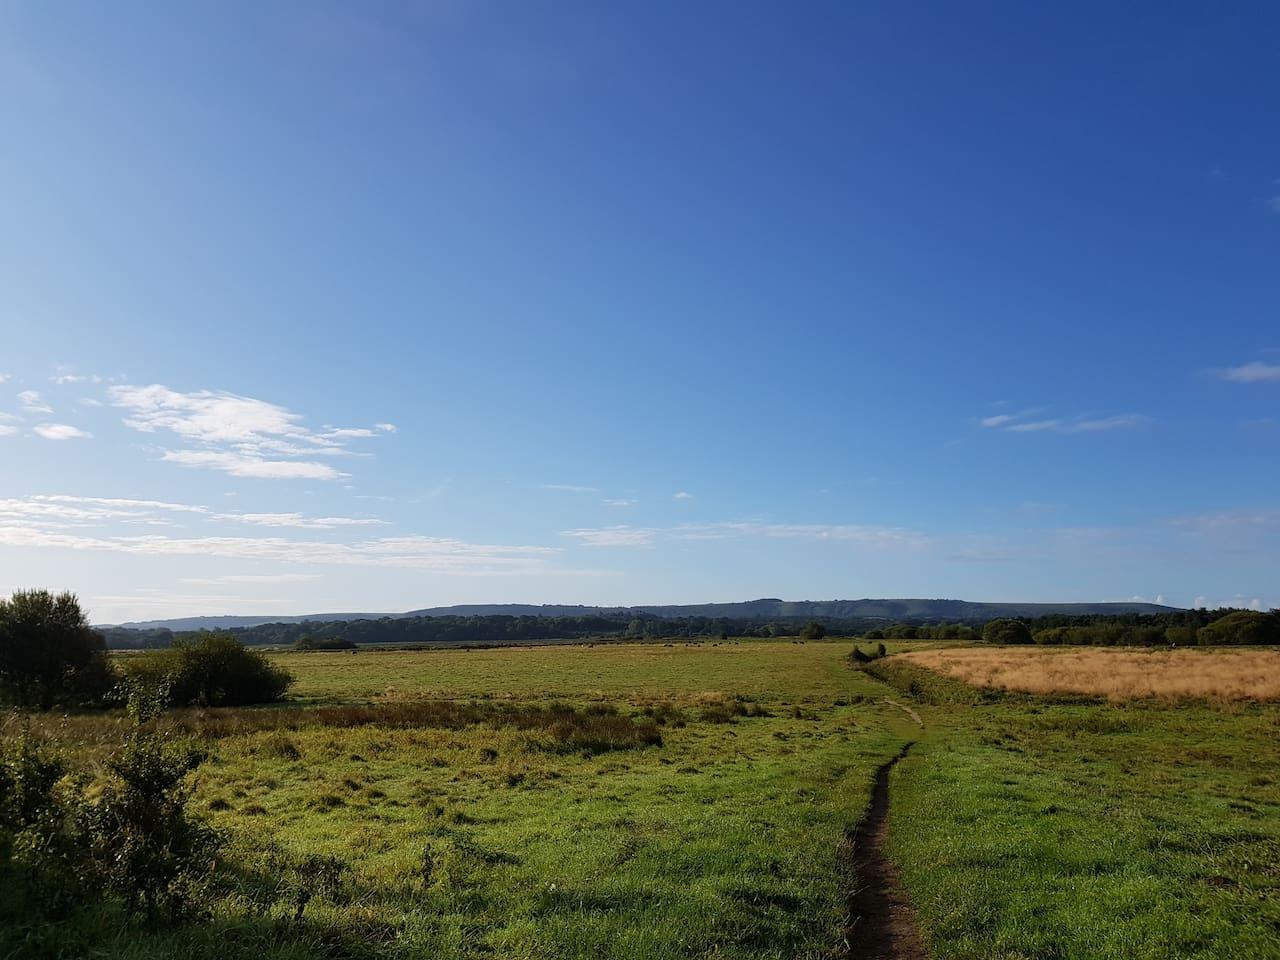 Pulborough wildlife santuary...  2 minutes walk away